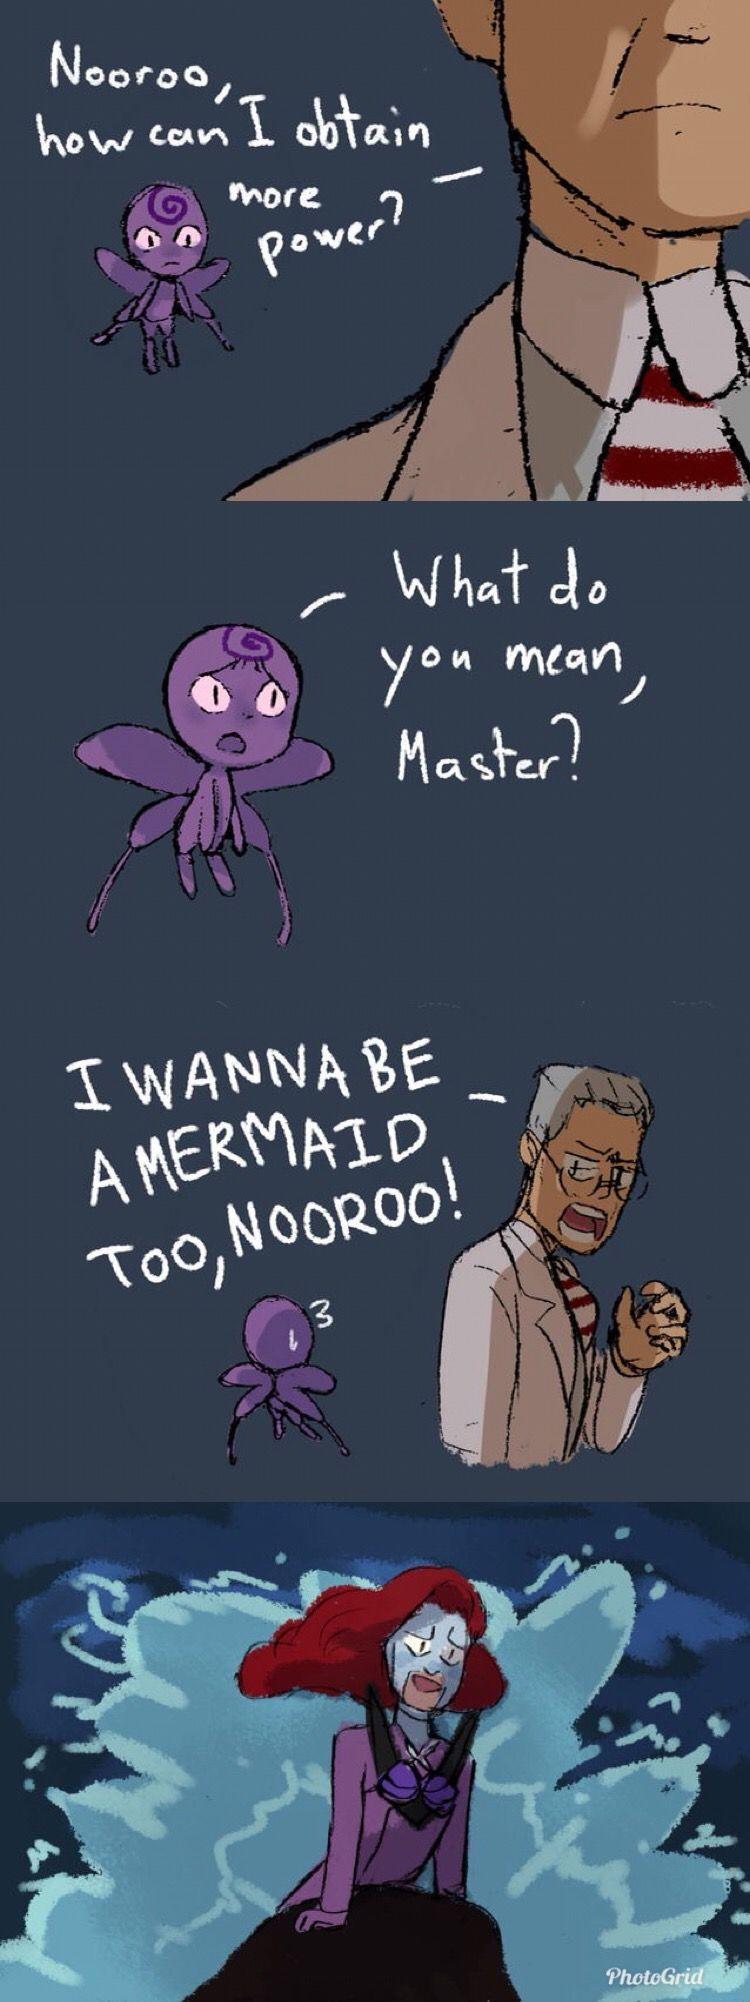 Lol i wanna be a mermaid too nooroo miraculous miraculous ladybug miraculous for Adrien harper watches